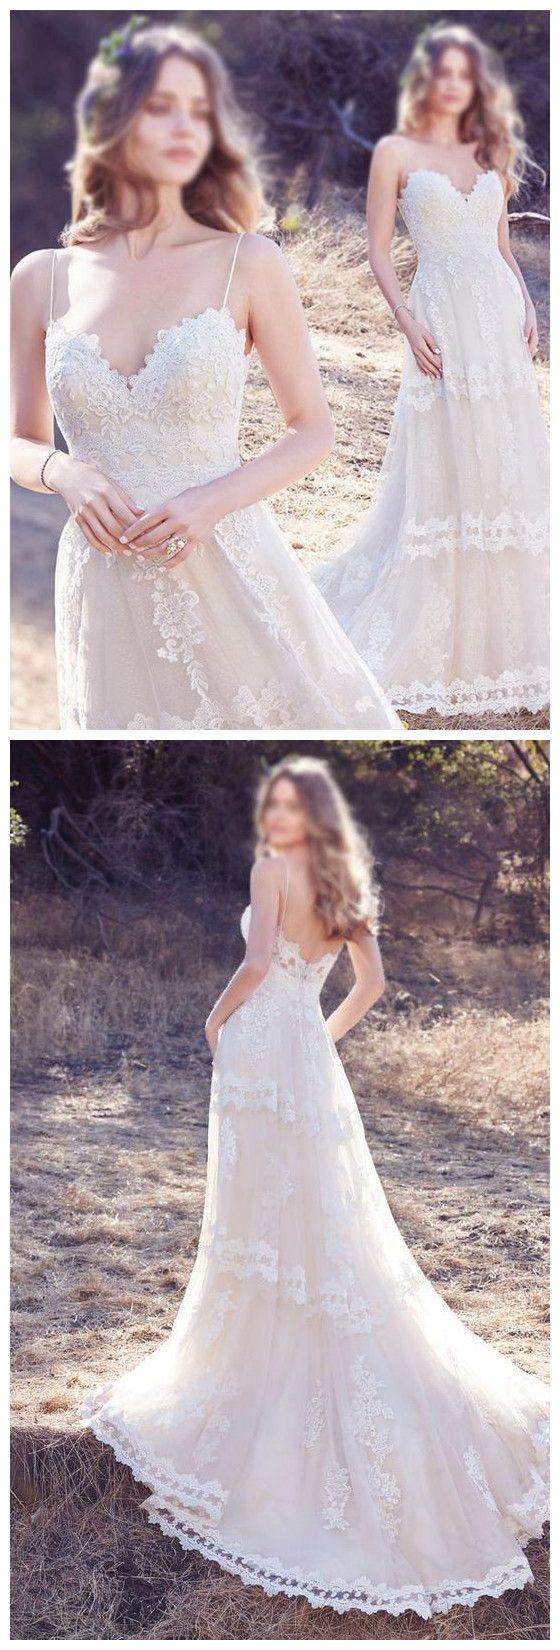 aline prom dresses white spaghetti straps lace long prom dress